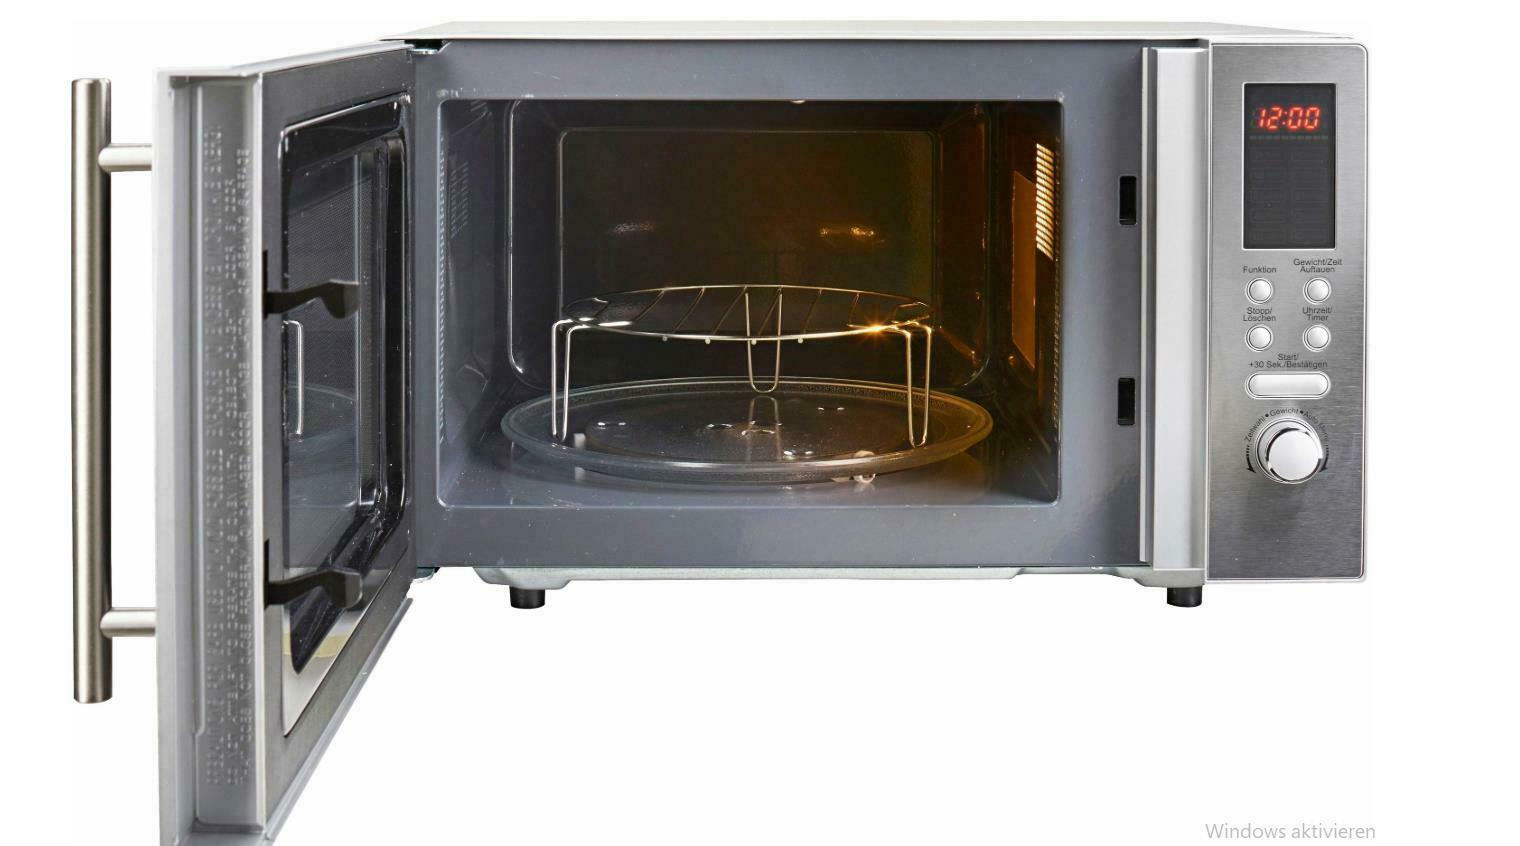 Hanseatic Mikrowelle AS823EBB-P Grill und Heißluft 23 l 3-in-1 Gerät edelstahl